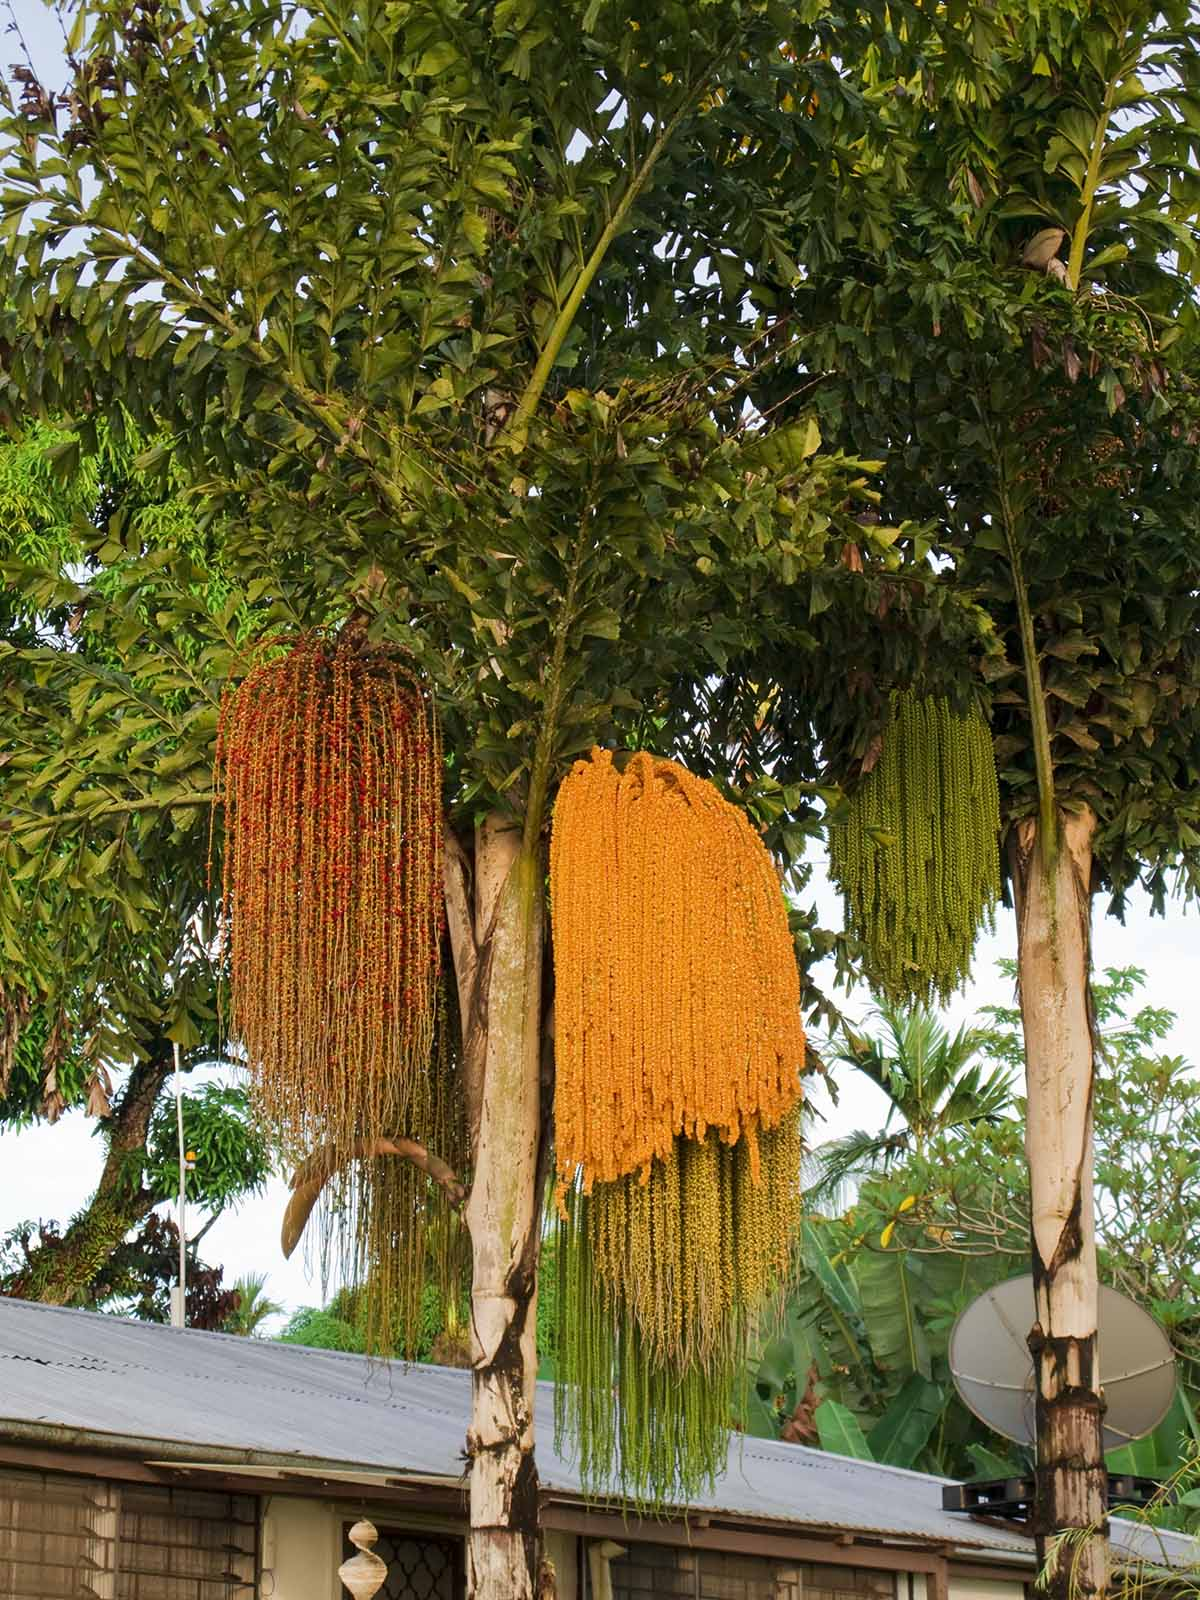 Fishtail Palms (Caryota gigas).